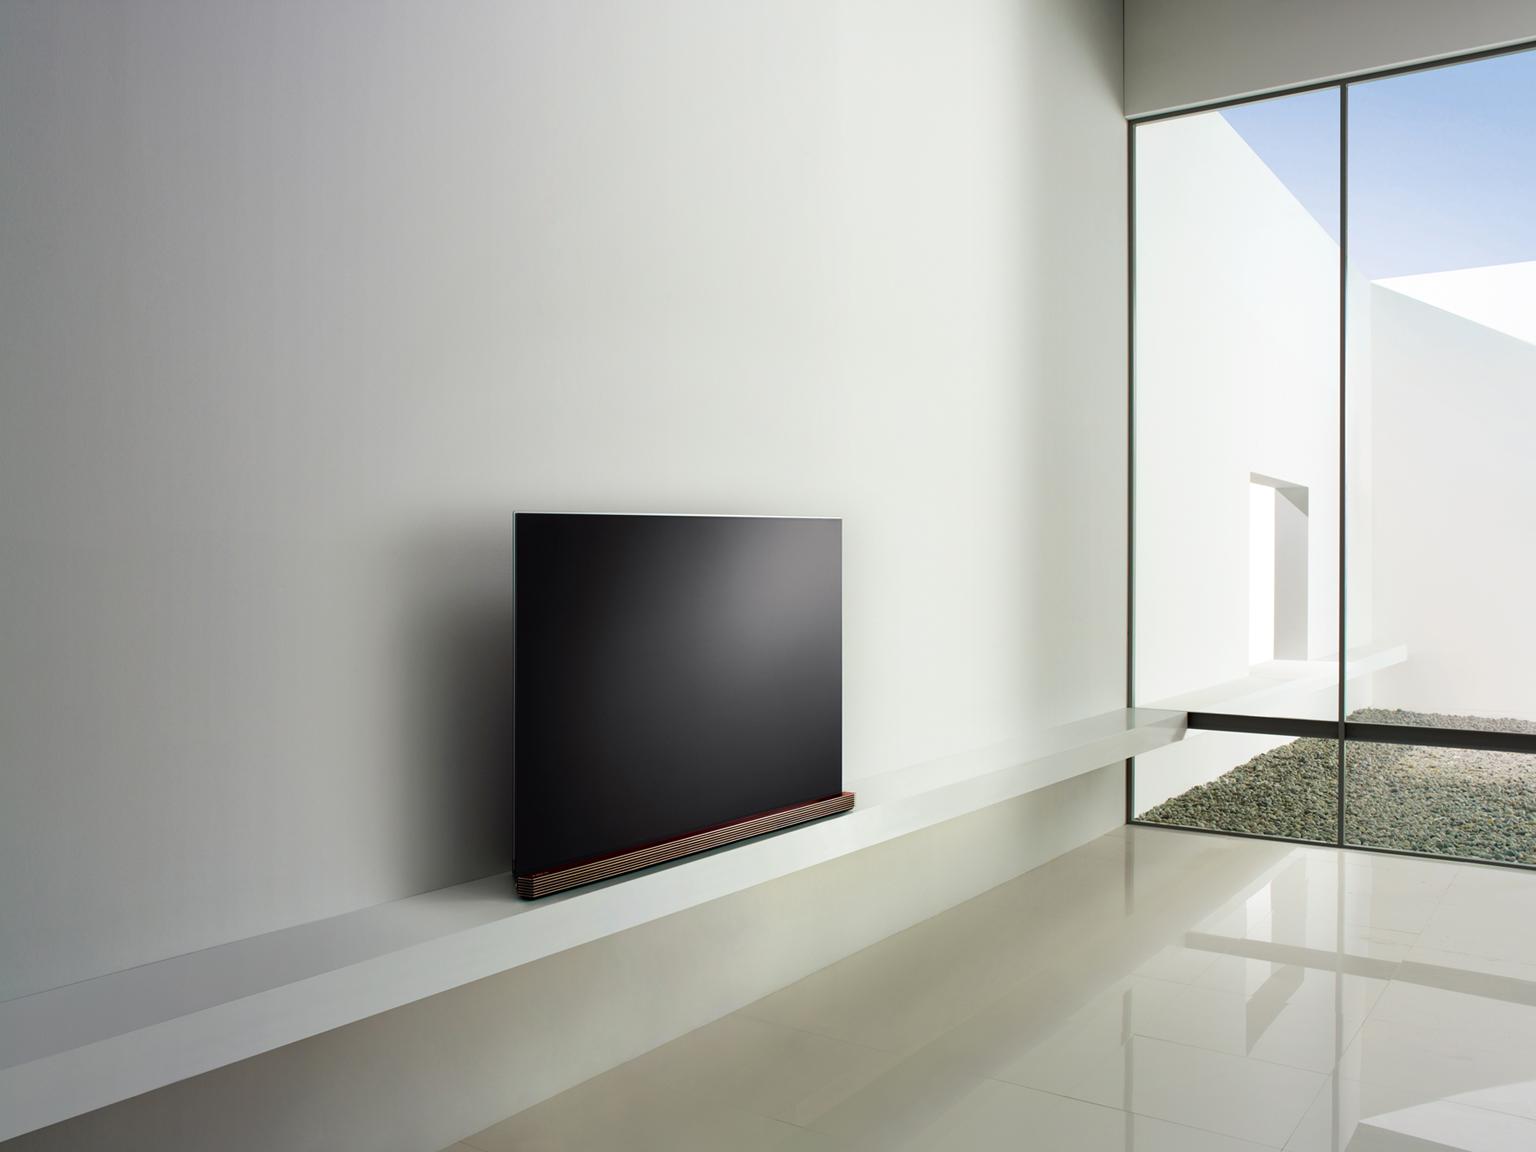 LG_TV2